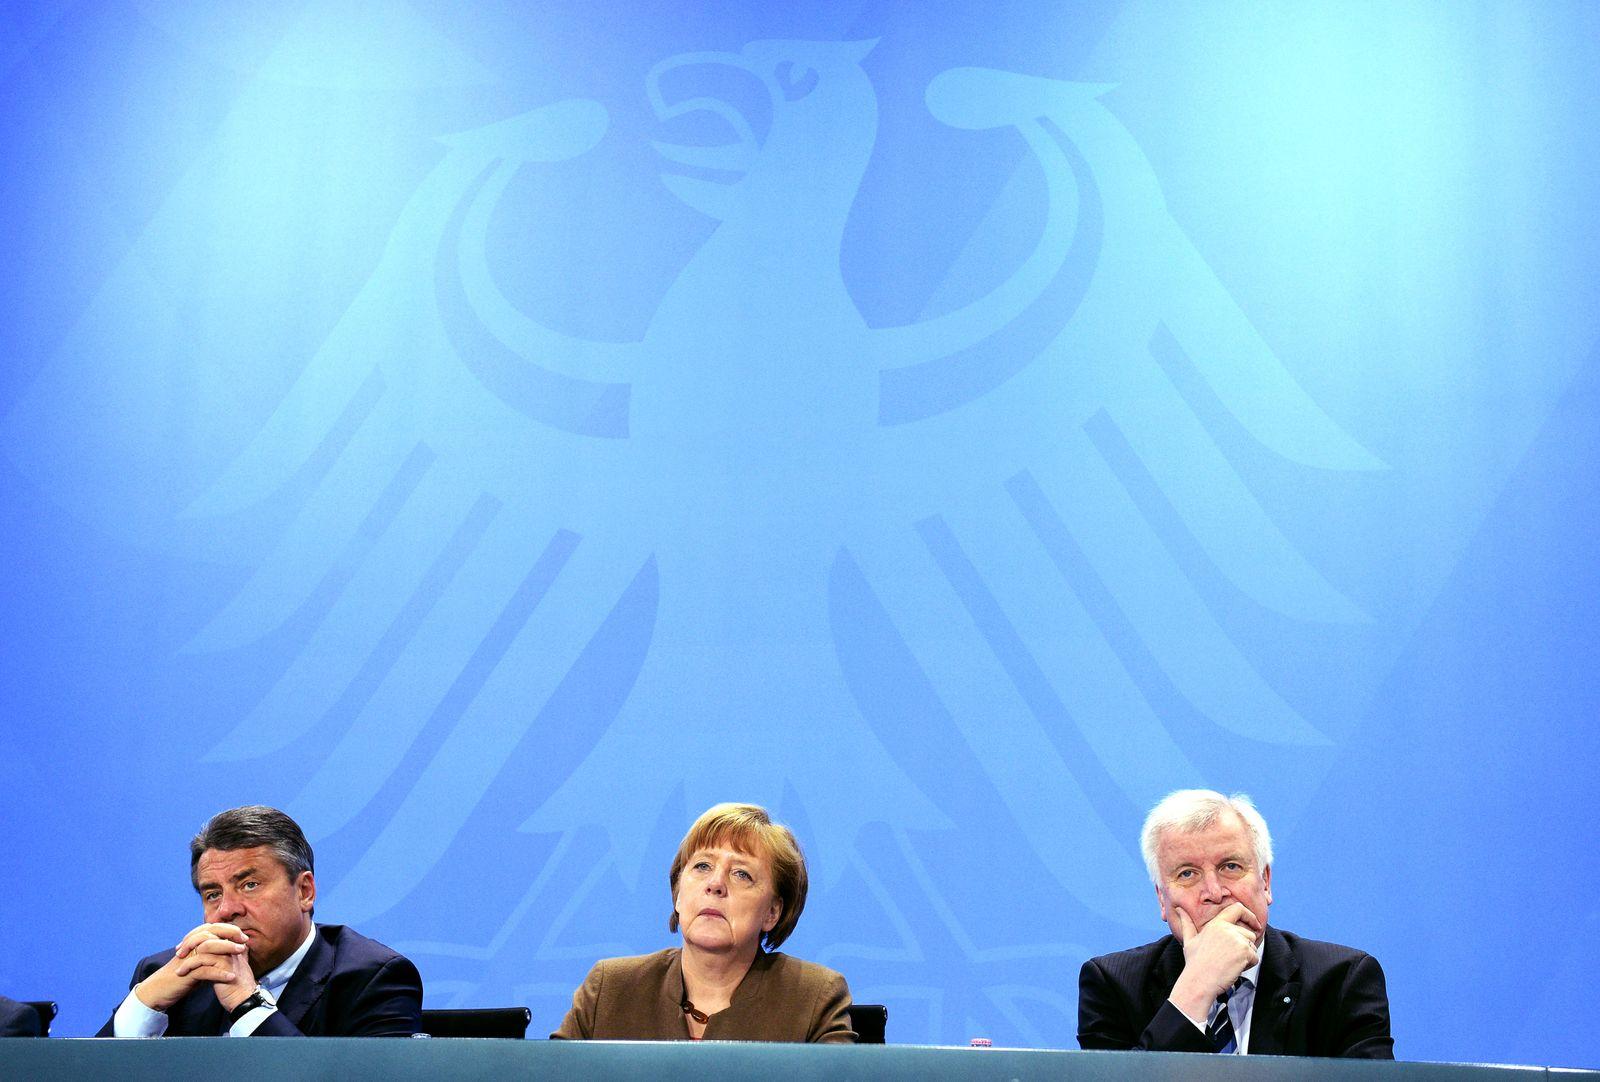 Sigmar Gabriel / Angela Merkel / Horst Seehofer